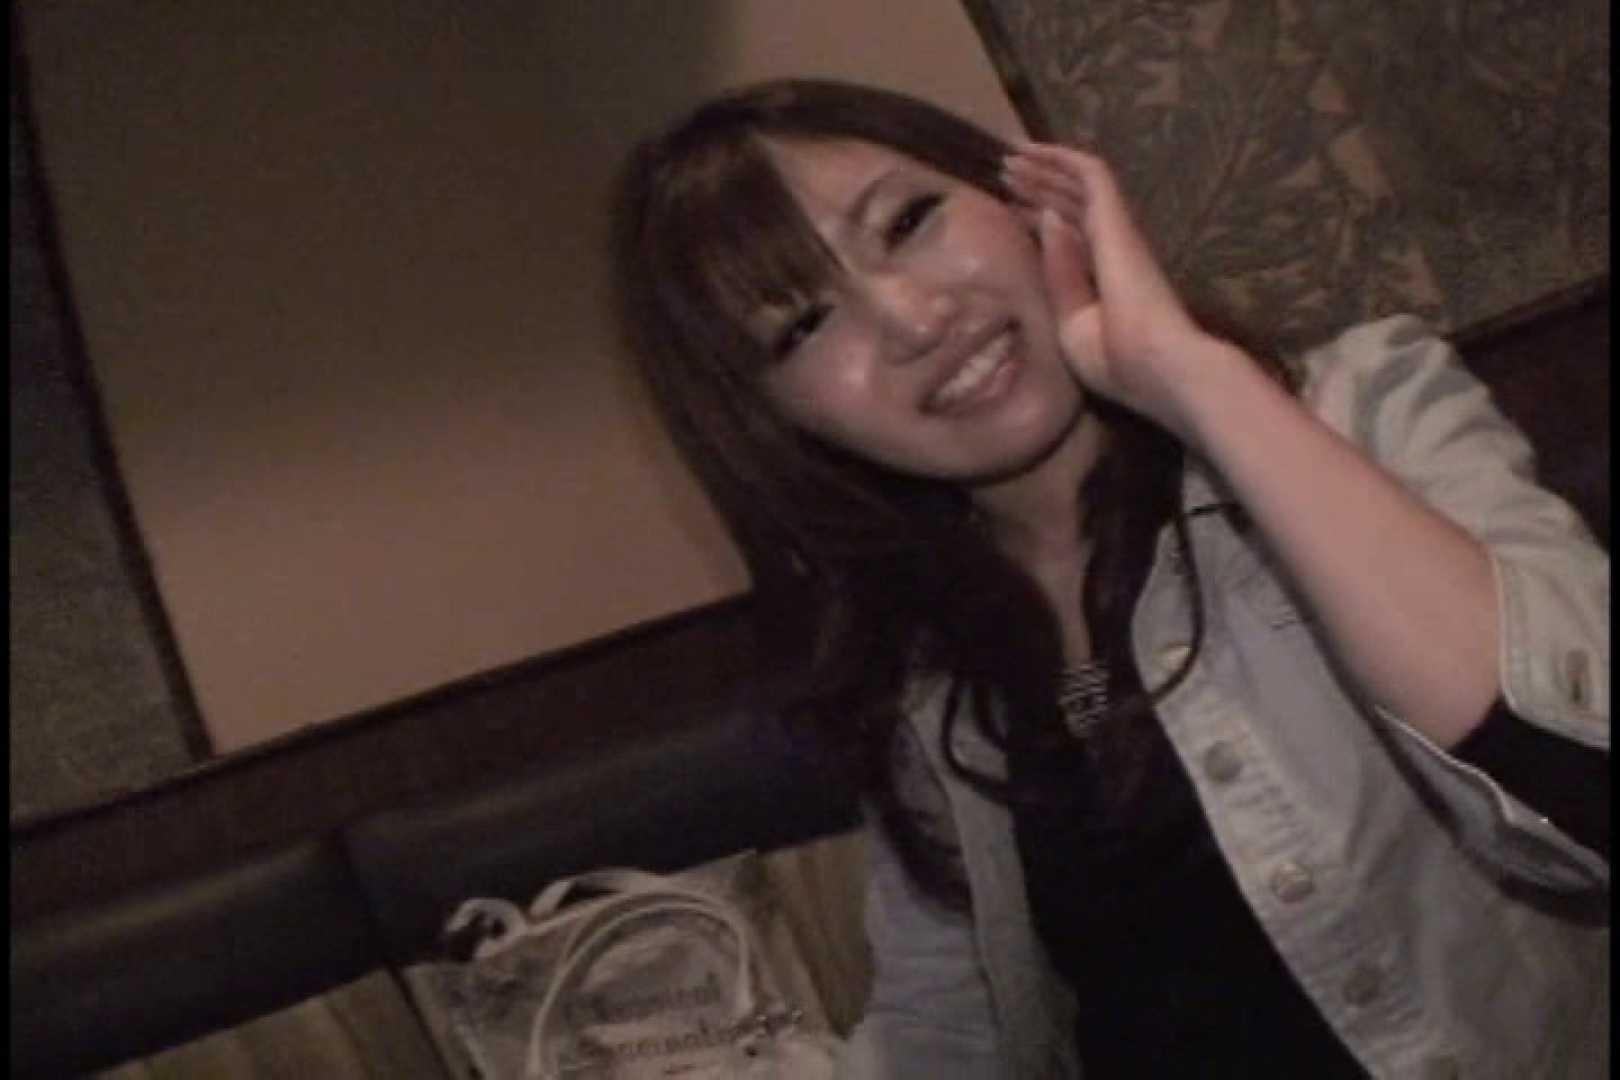 JDハンター全国ツアー vol.042 後編 女子大生のエロ動画  104PIX 2